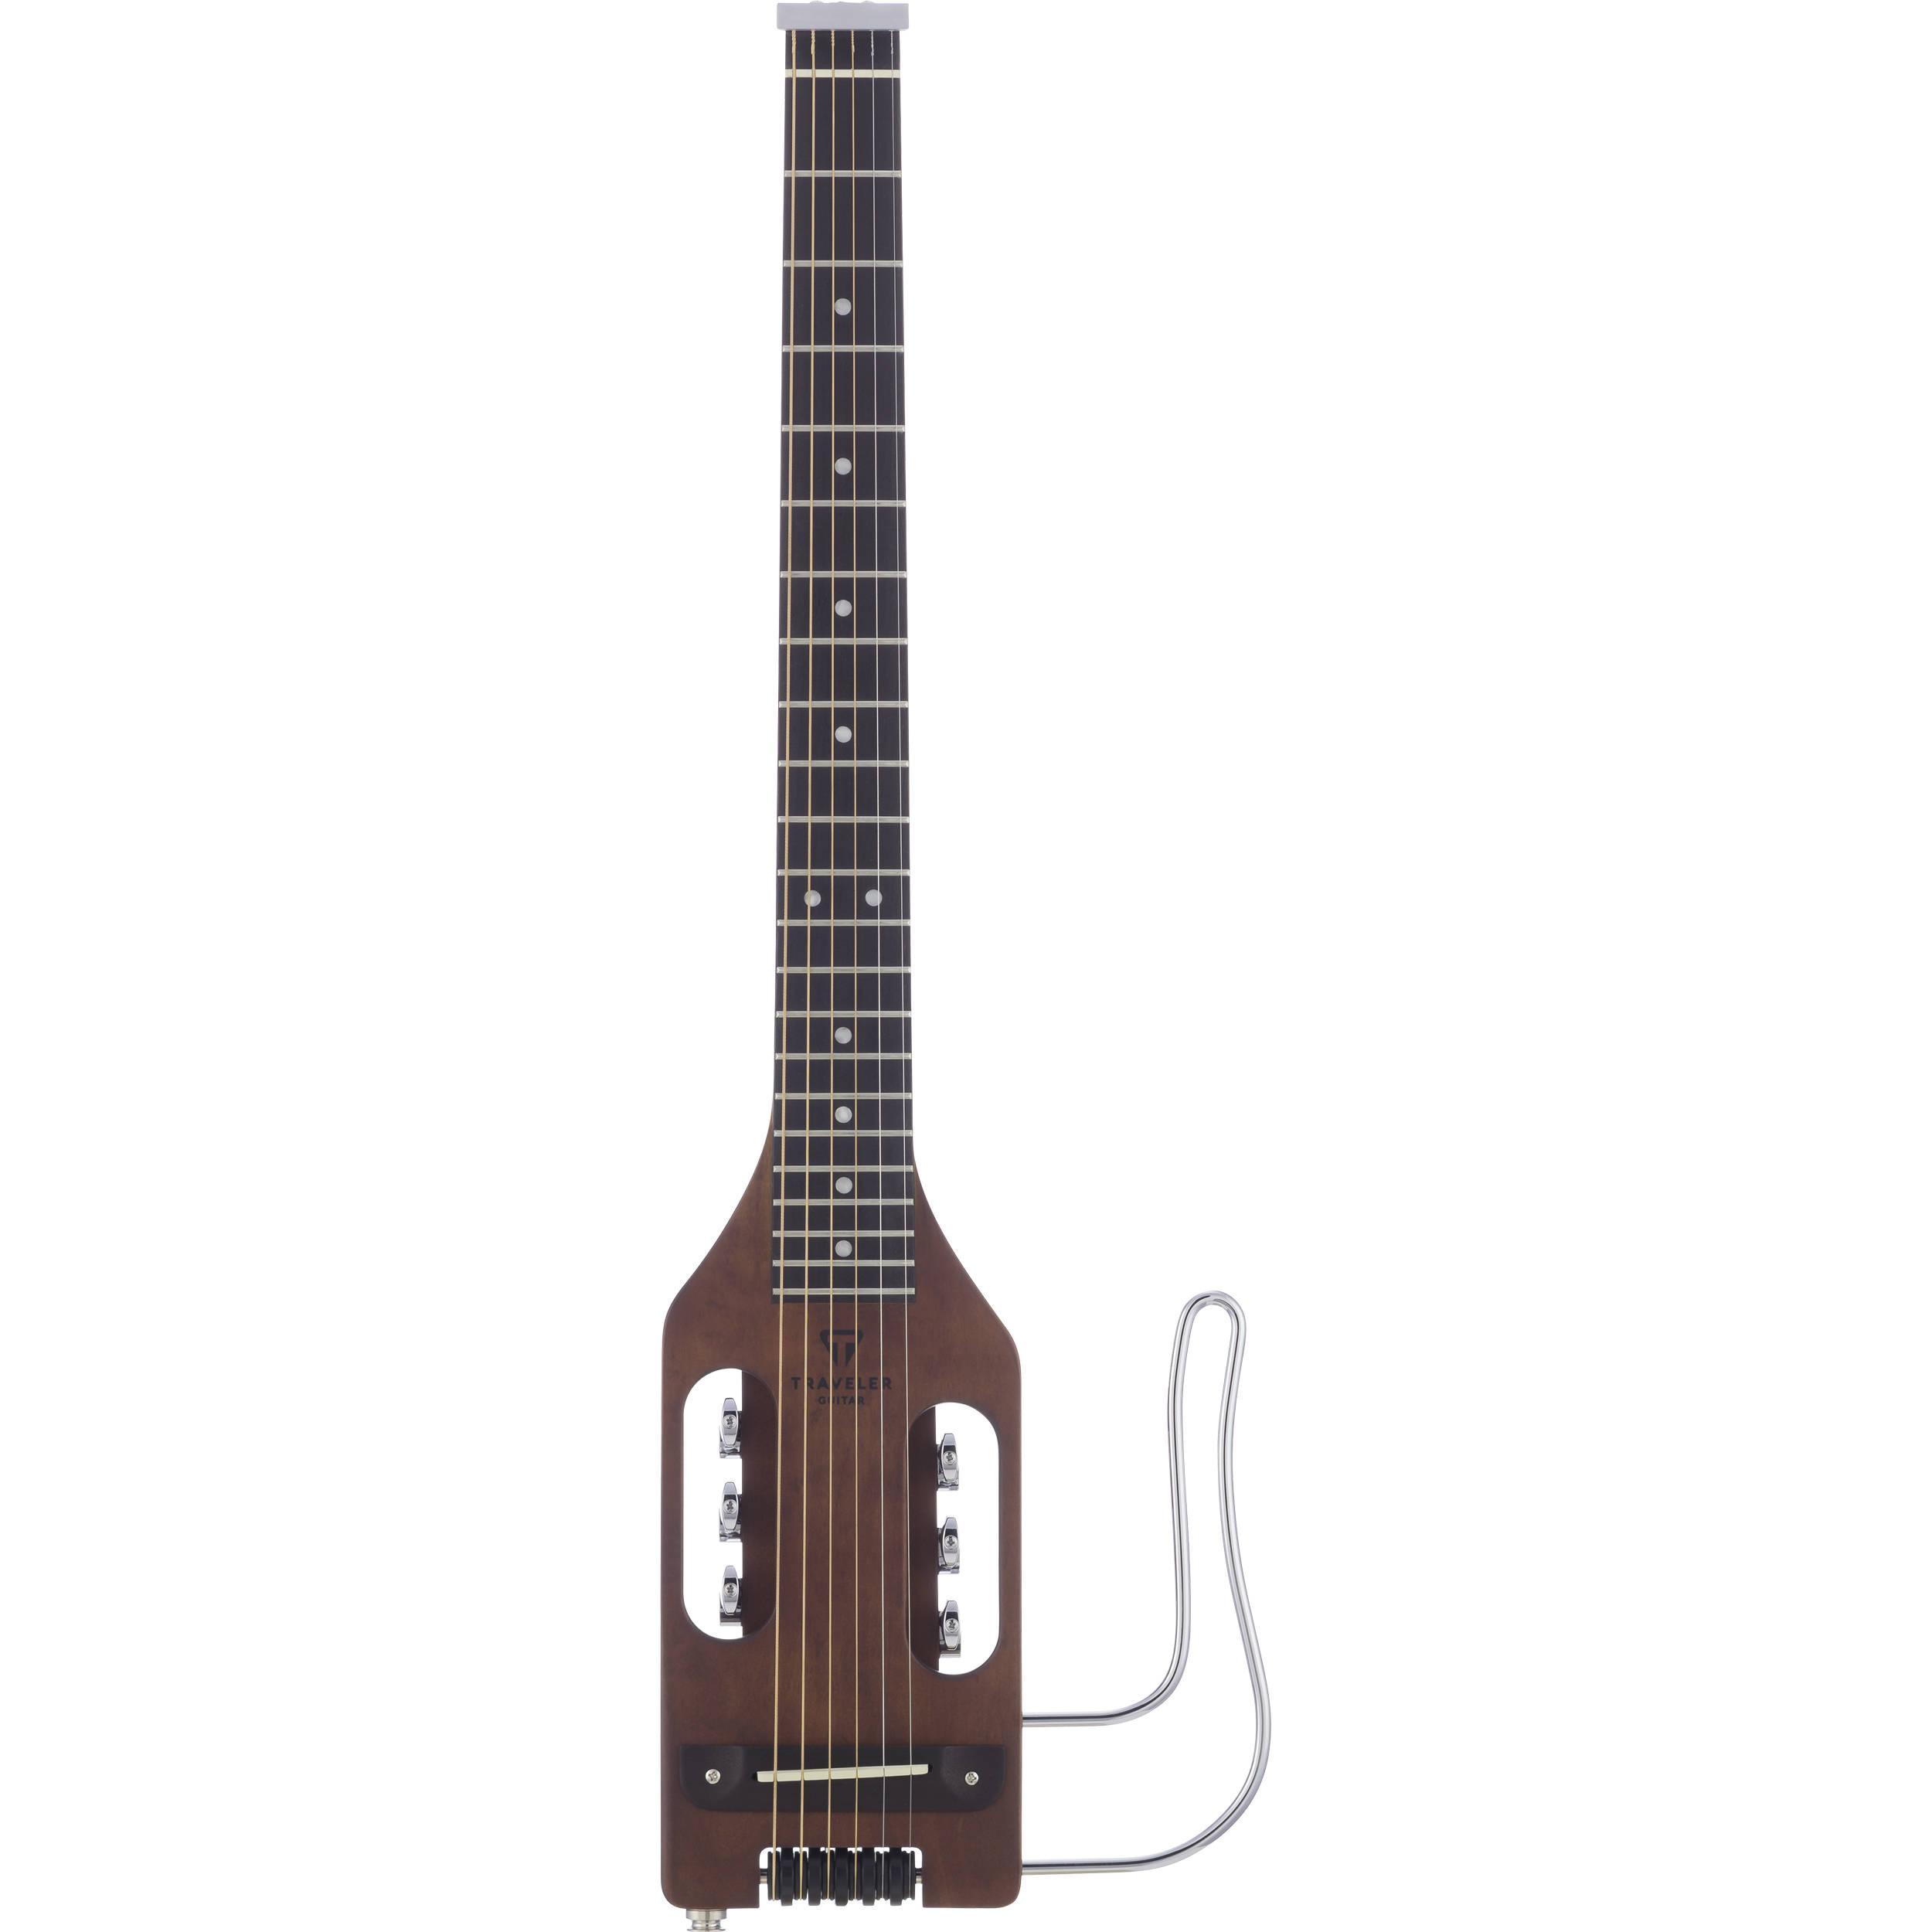 traveler guitar ultra light compact acoustic electric ulst brn. Black Bedroom Furniture Sets. Home Design Ideas